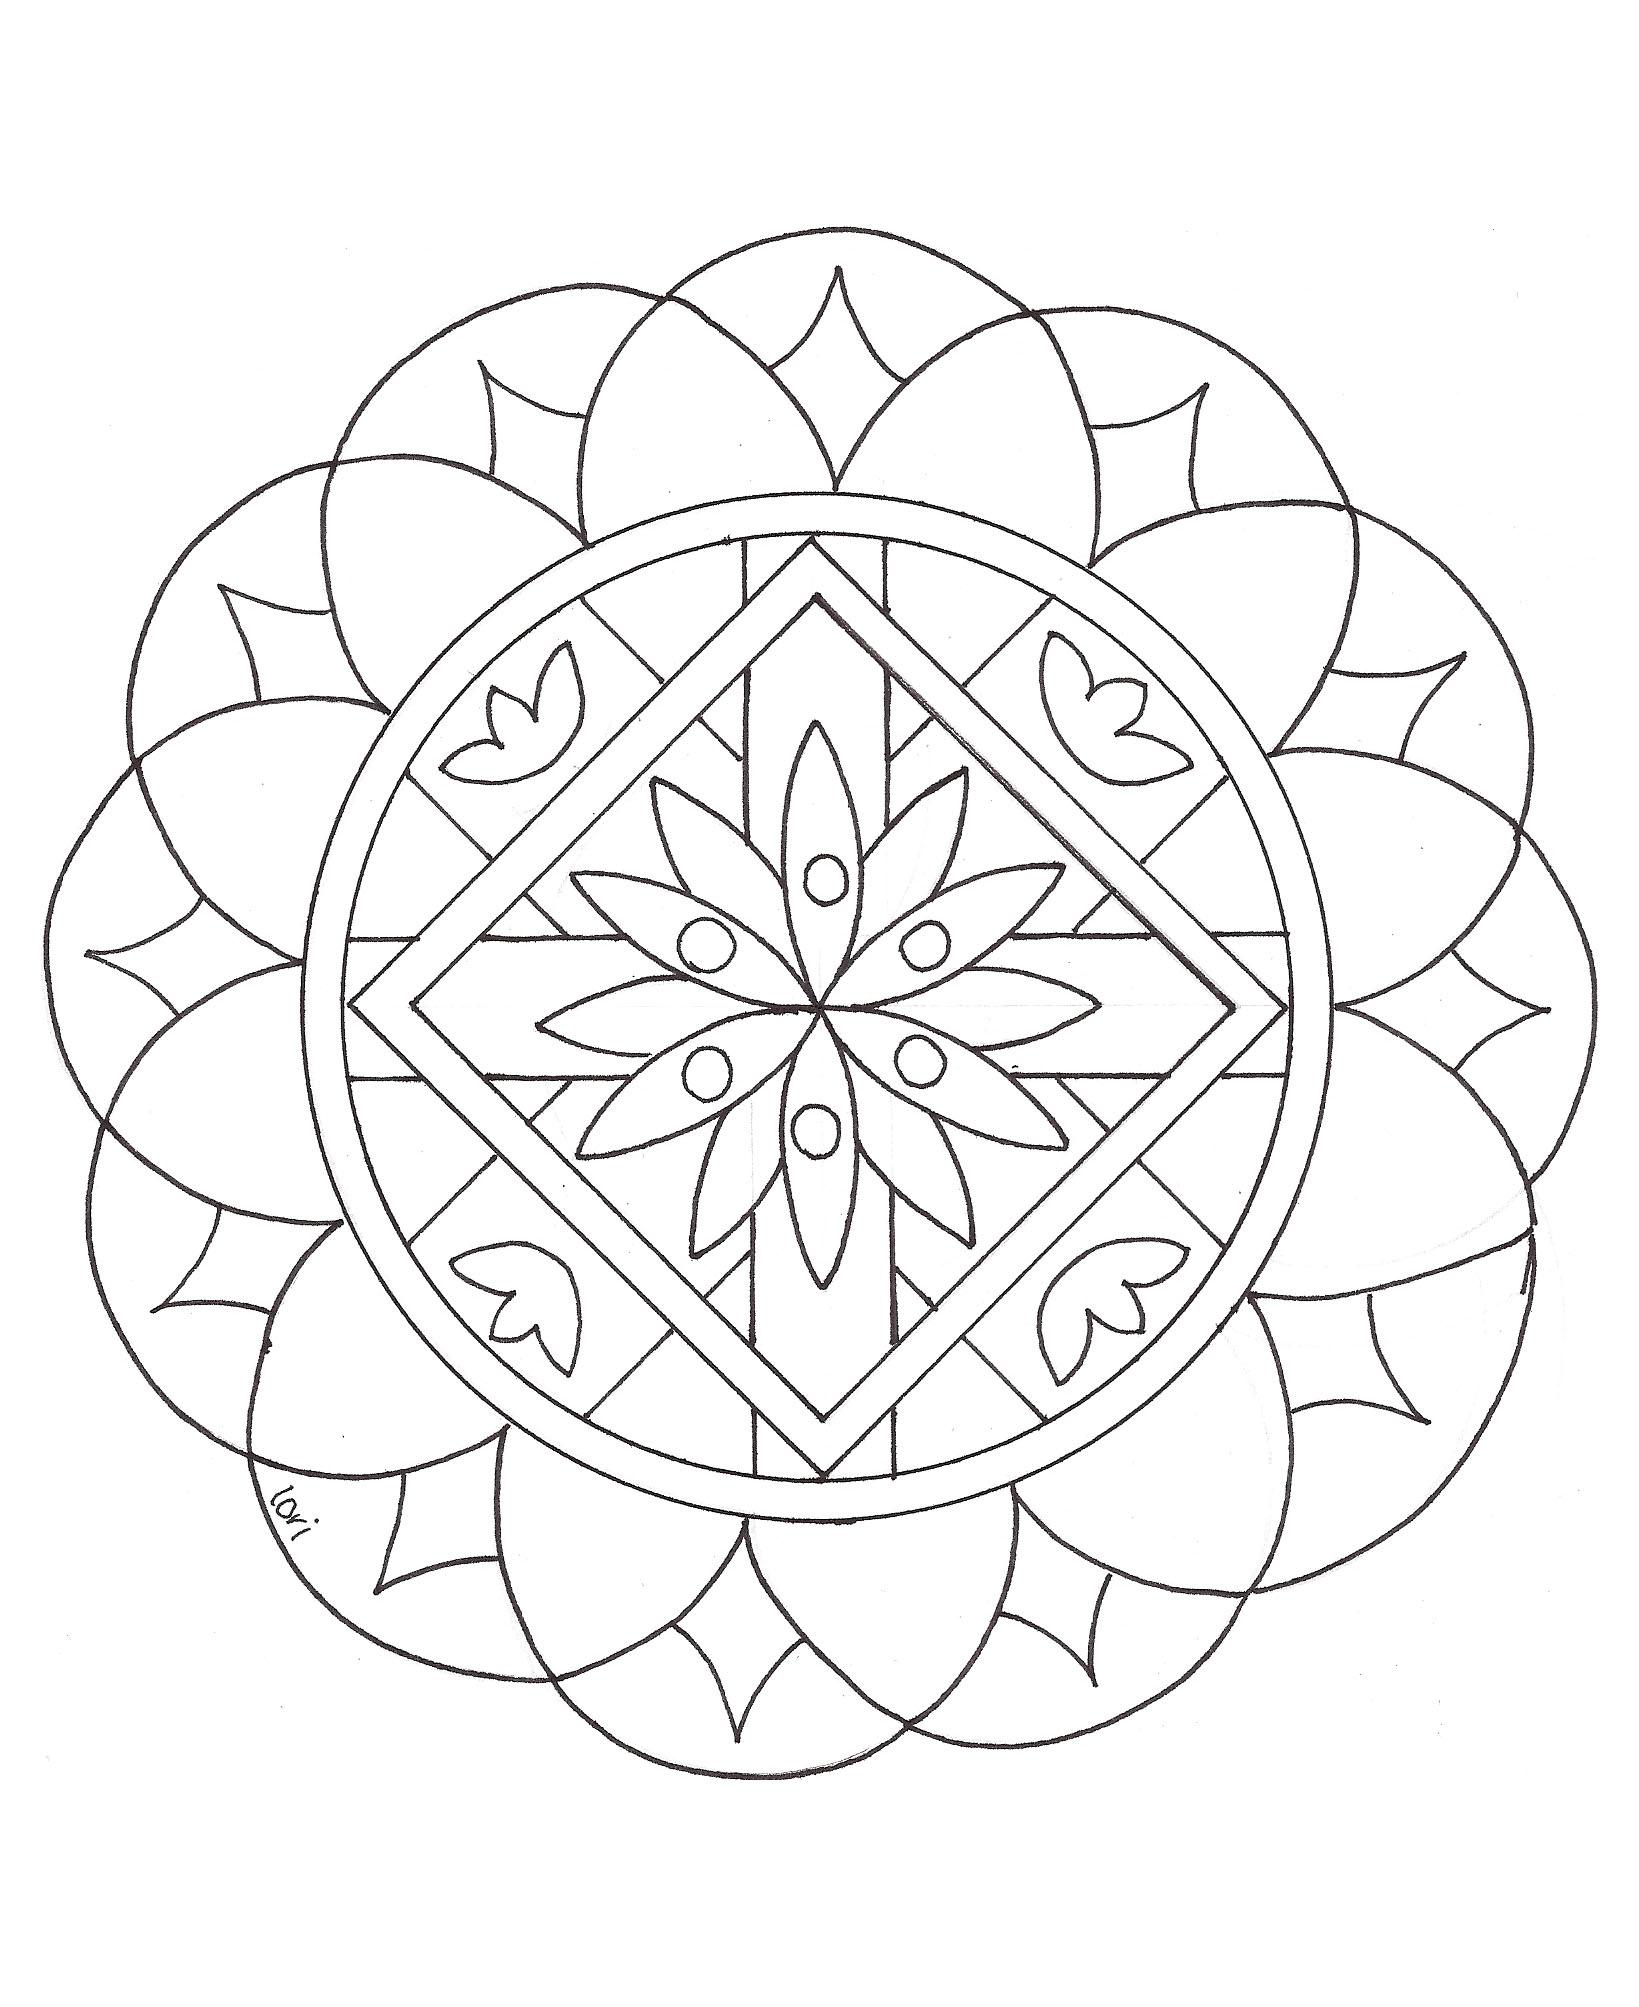 Mandala a imprimer 2 coloriage mandalas coloriages - Imprimer coloriage mandala ...